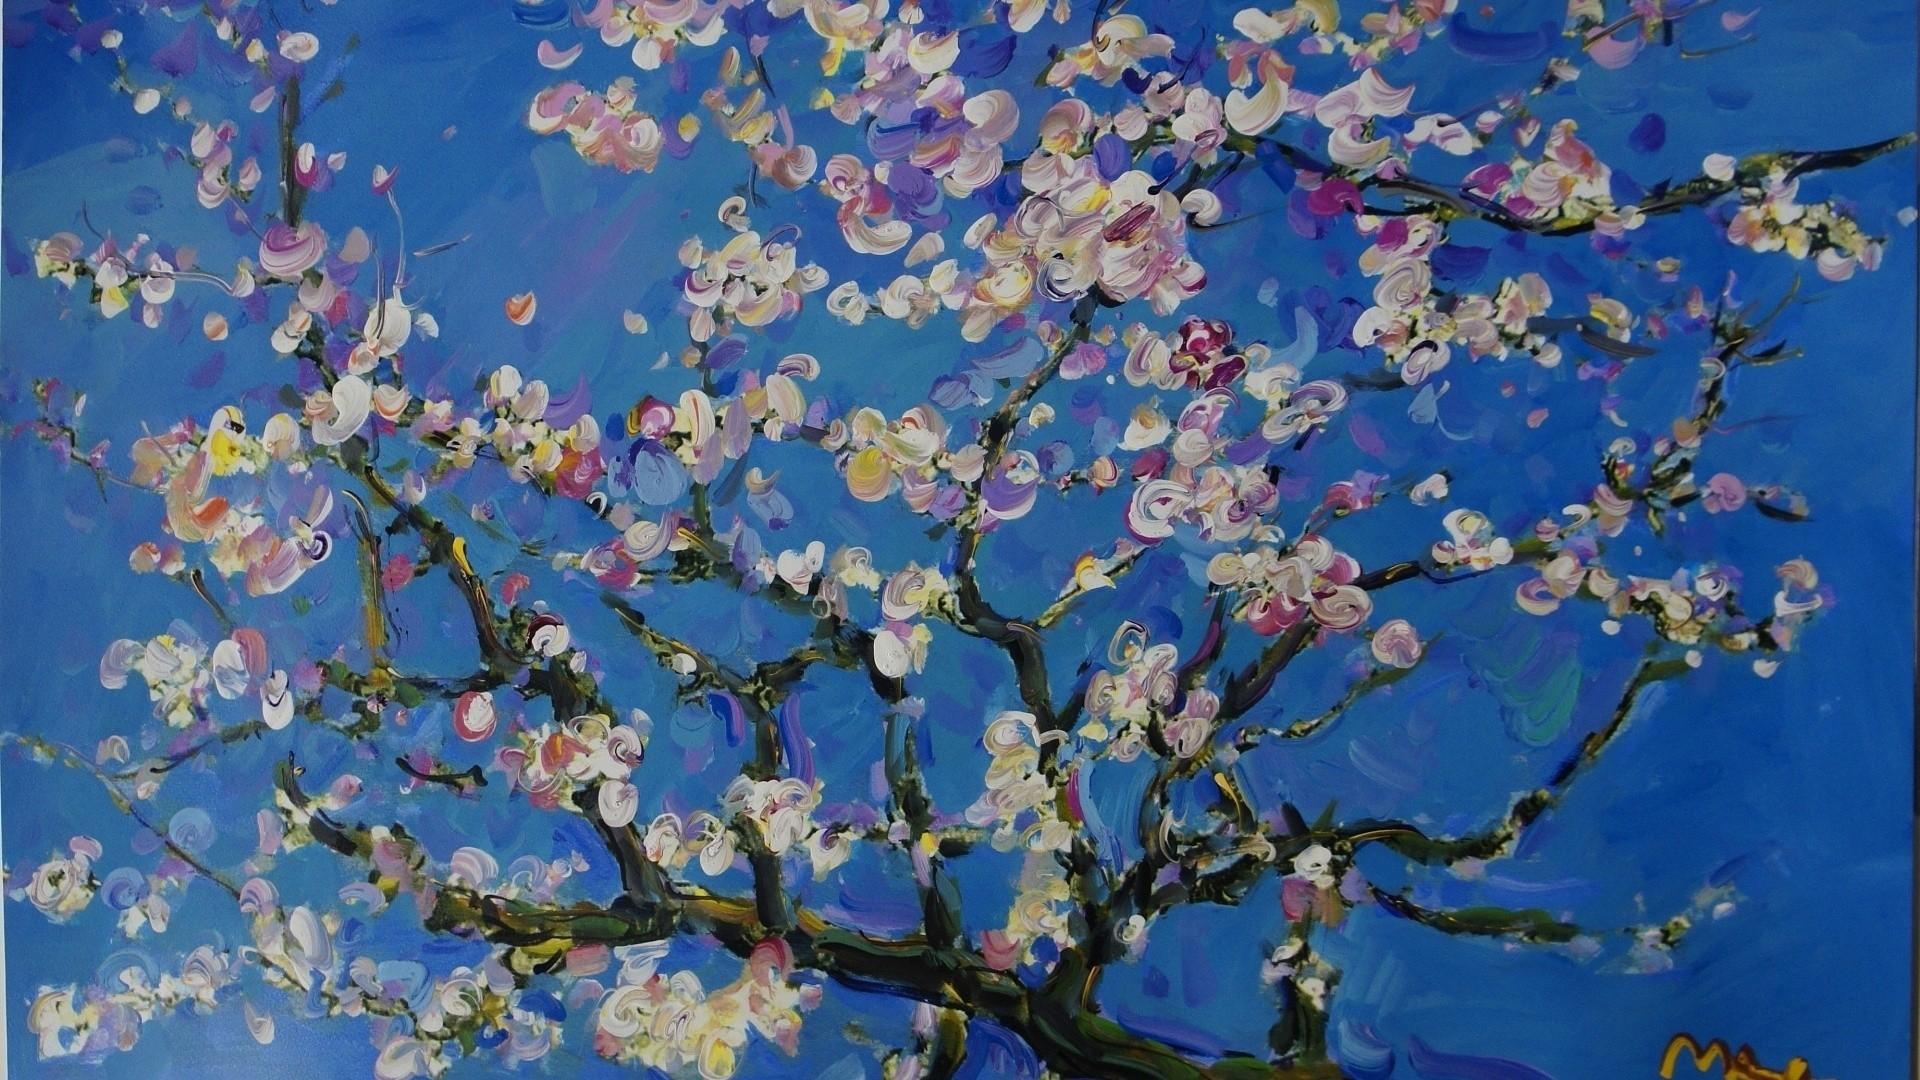 Van Gogh Starry Night Wallpapers - Top Free Van Gogh ... |Van Gogh Wallpaper Starry Night